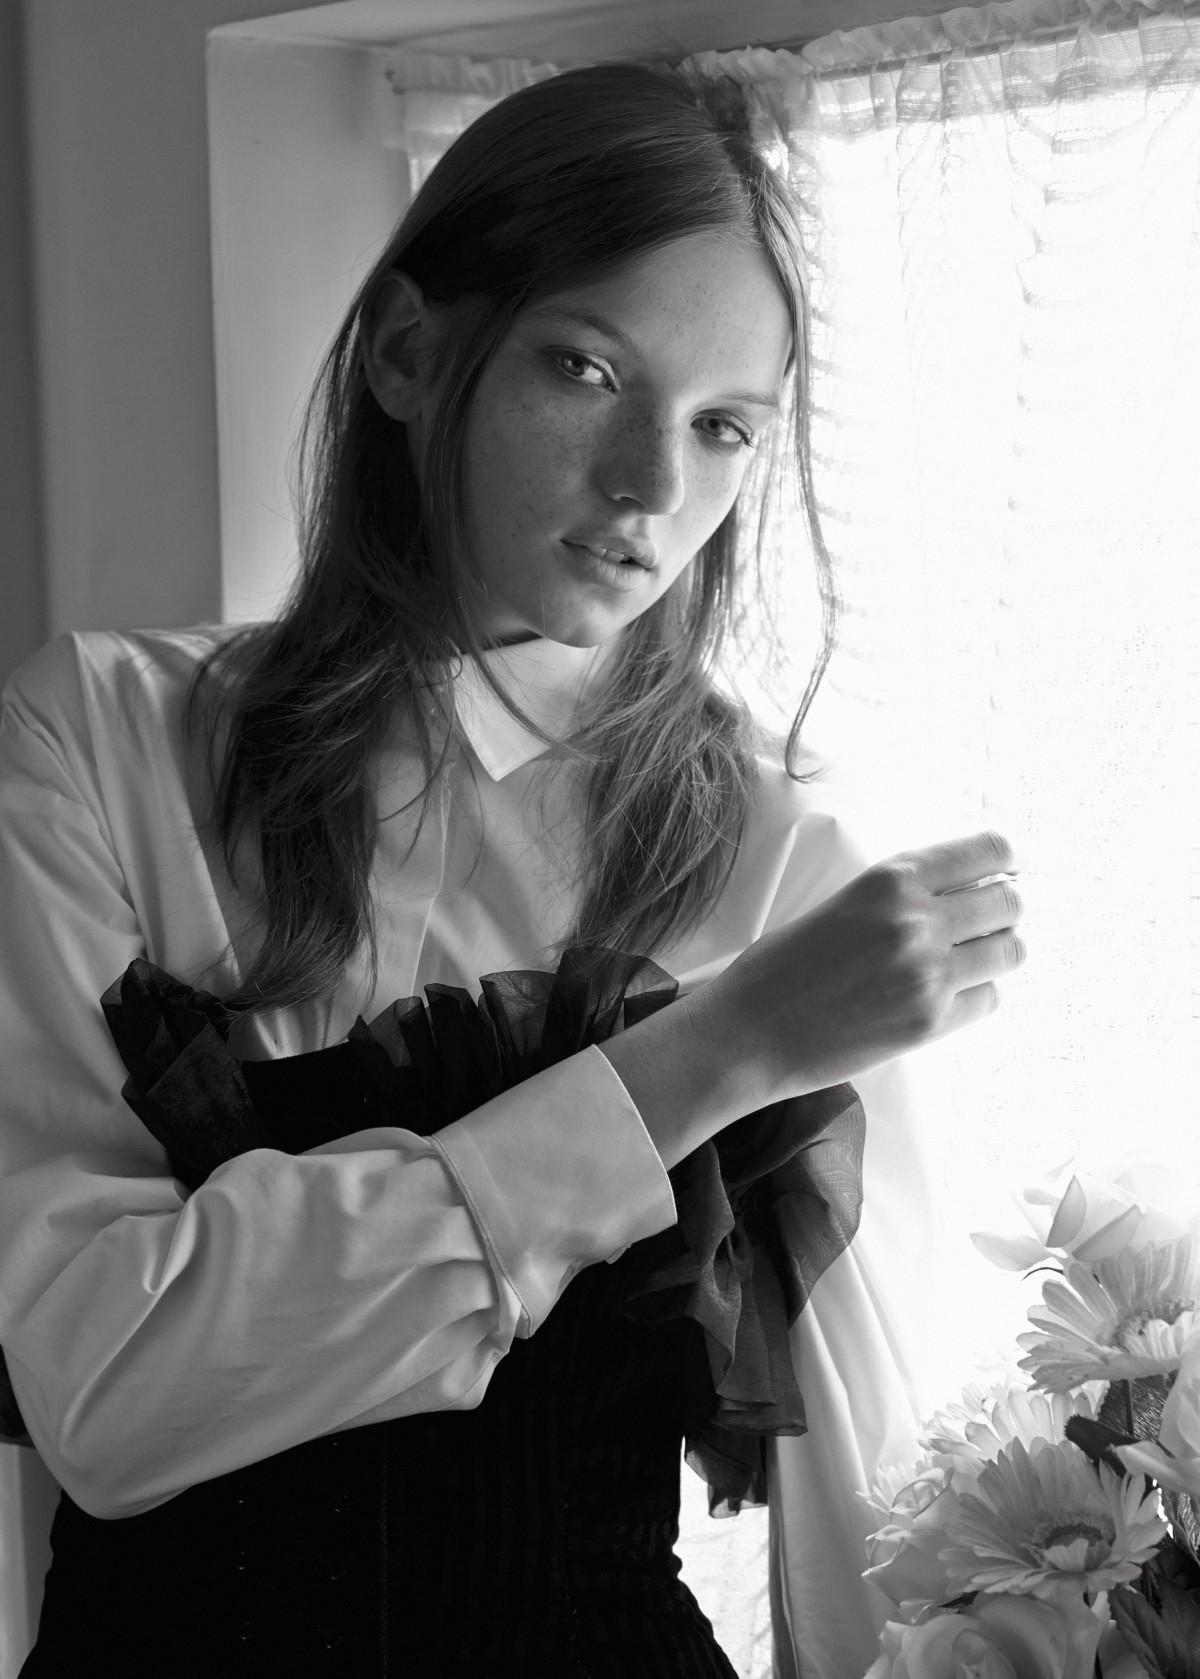 Alvar Magazine, Eva Klimkova, Punk, Mac Cosmetics, black & white